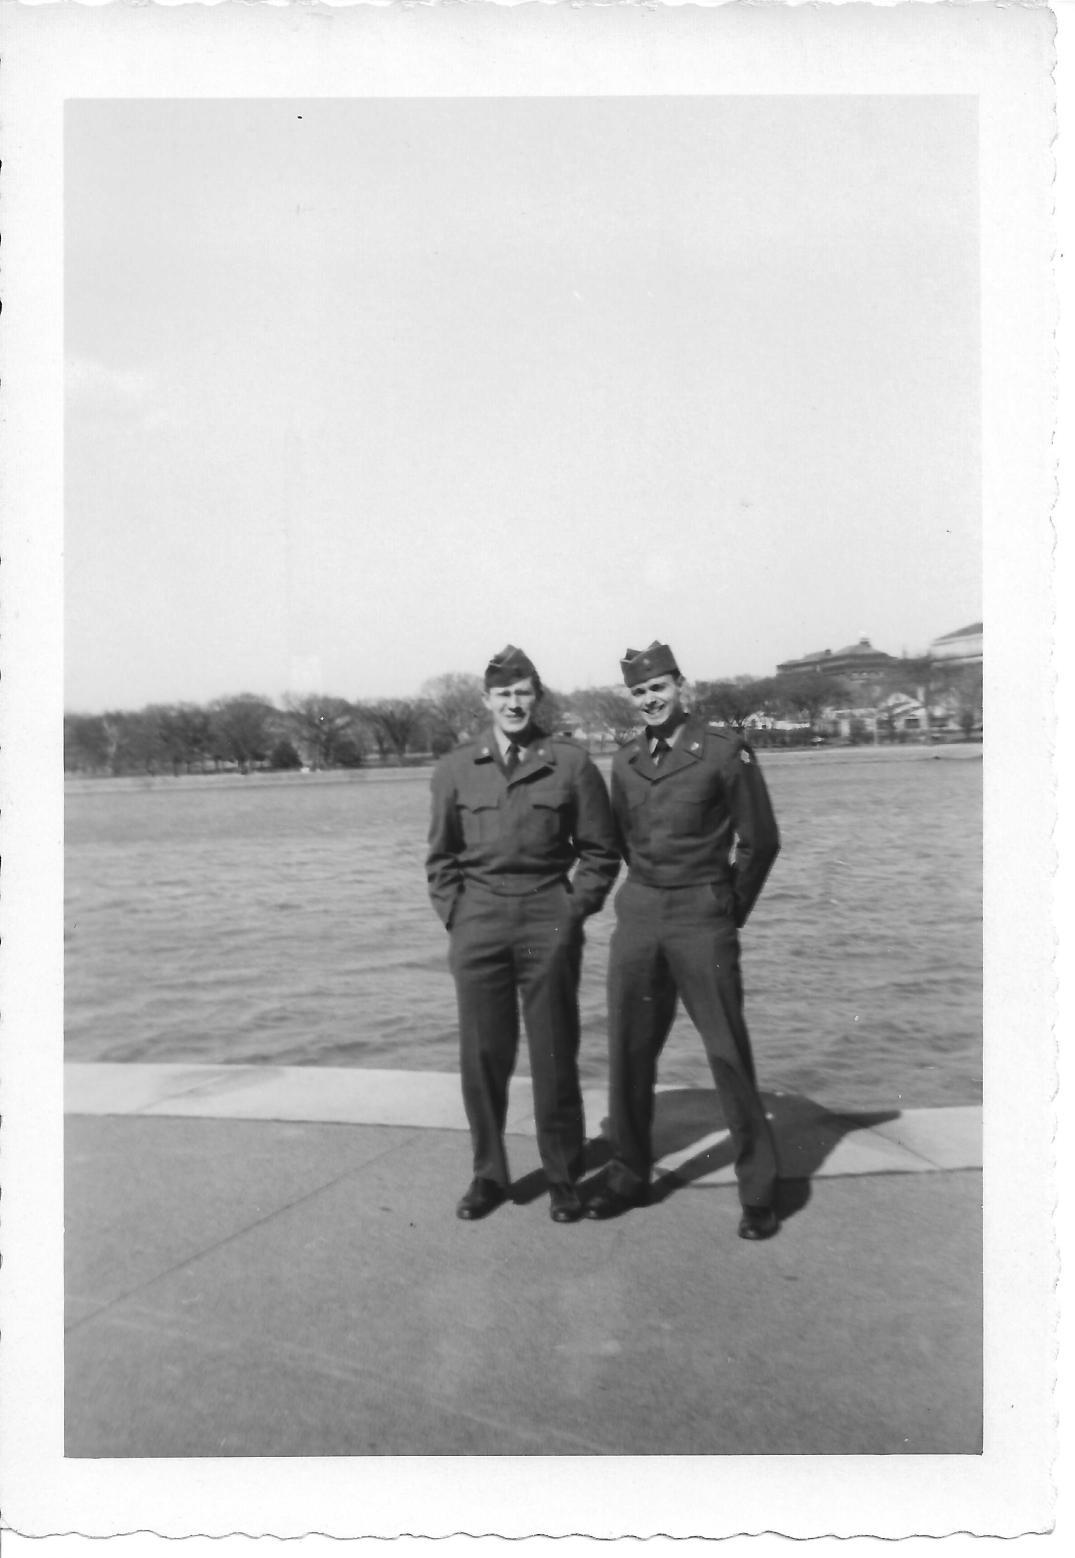 43 MASH Carl Olsen and Don Feeney, Washington DC, early 1953